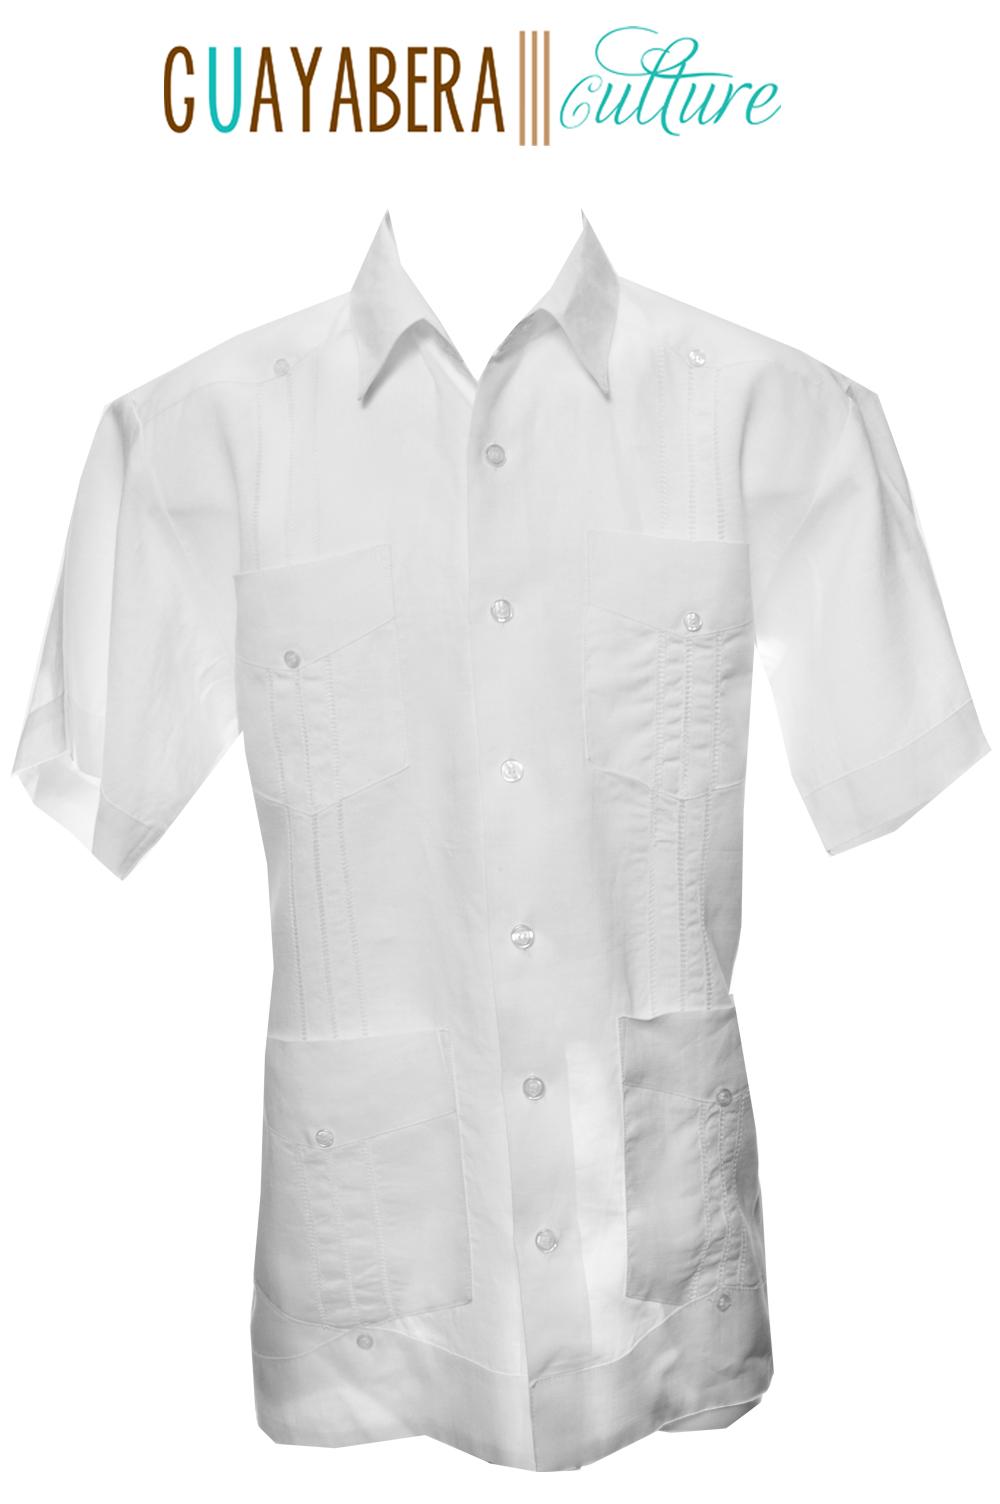 fbf182e7a0 Miami Short Sleeve Guayabera